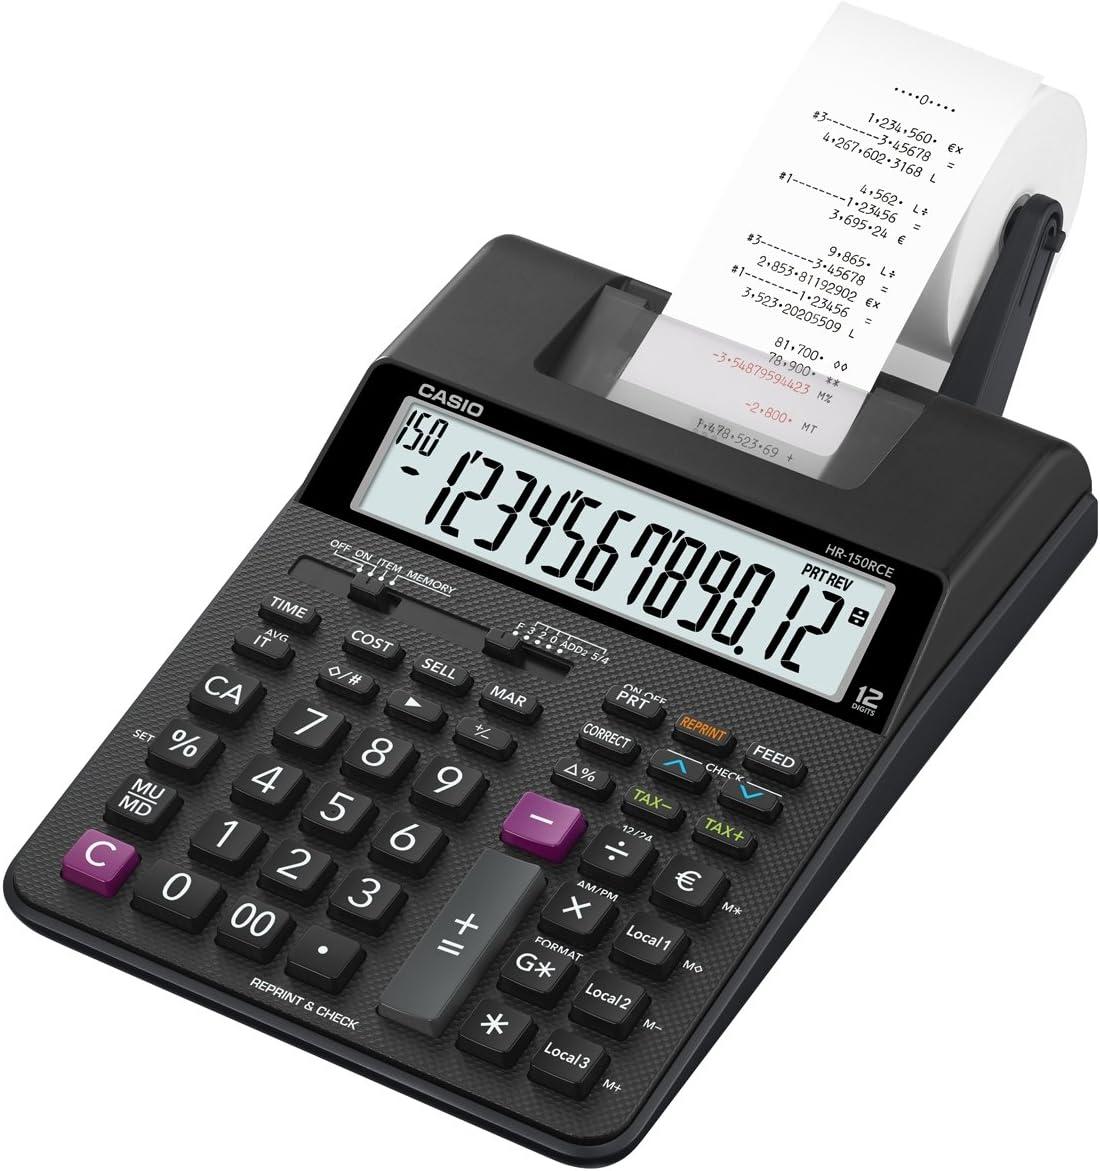 Casio HR-150RCE - Calculadora impresora, 6.5 x 16.5 x 29.5 cm, color negro